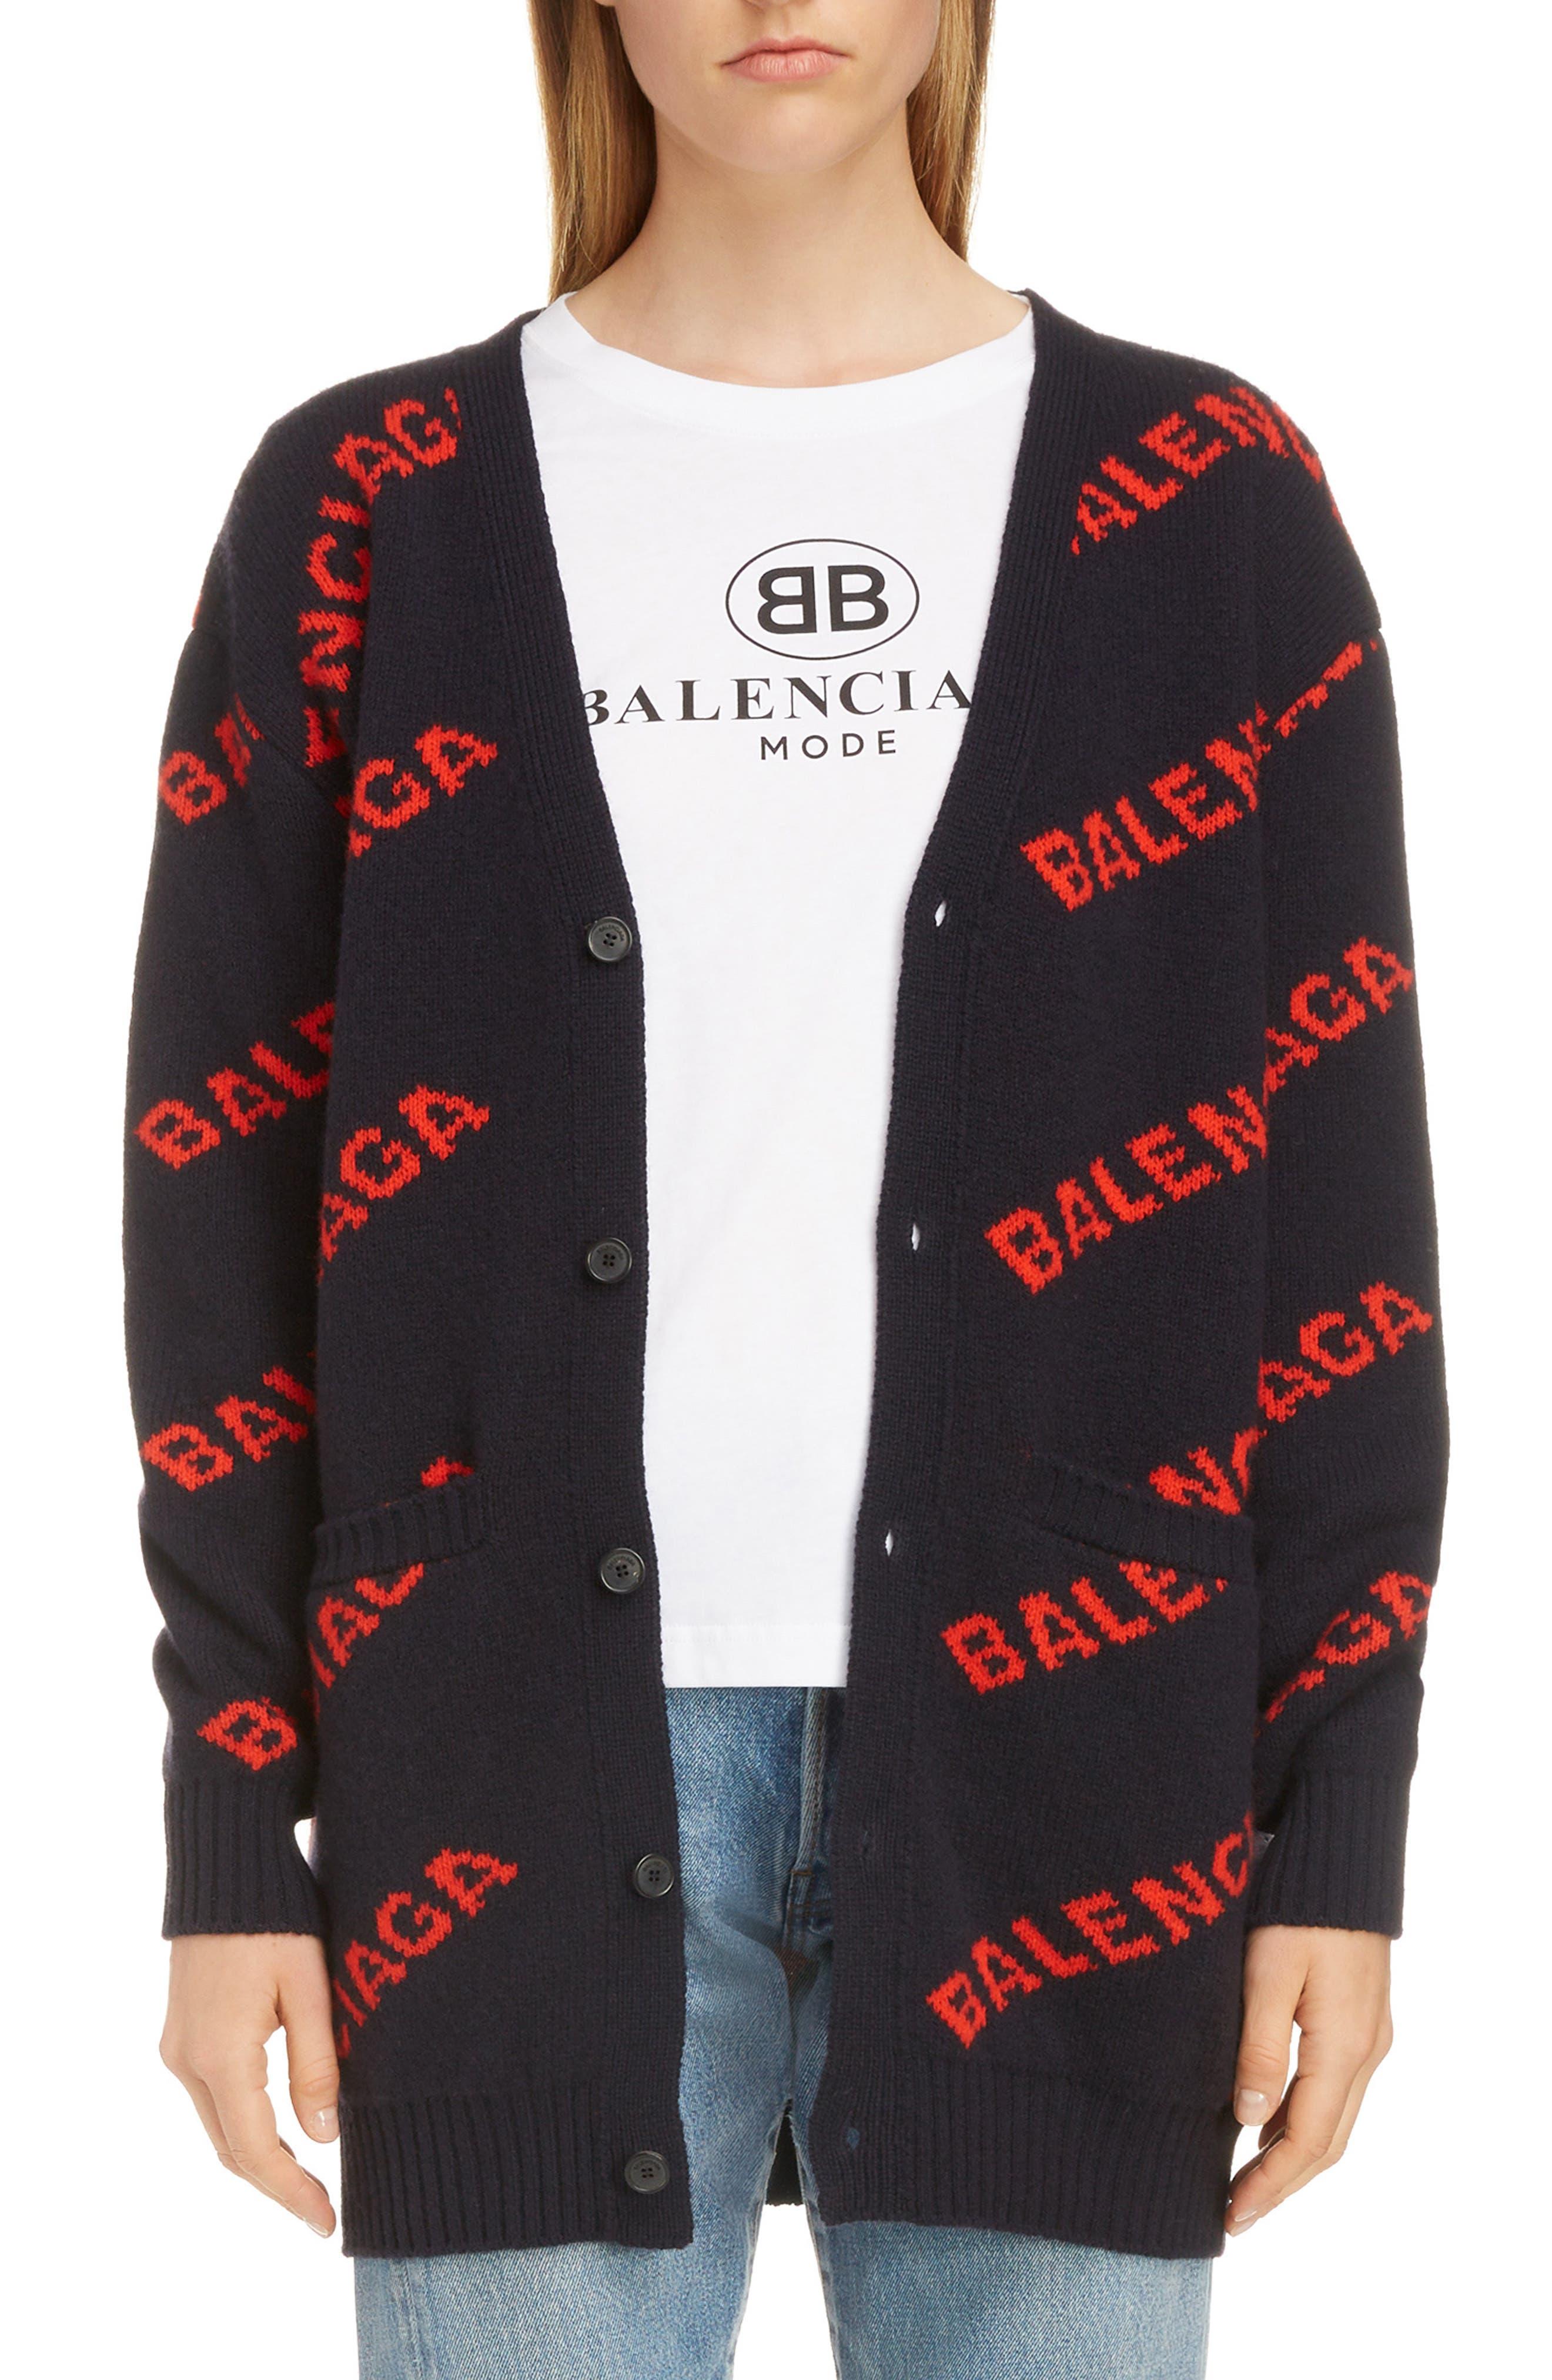 BALENCIAGA, Logo Jacquard Wool Blend Cardigan, Main thumbnail 1, color, NAVY/ ORANGE